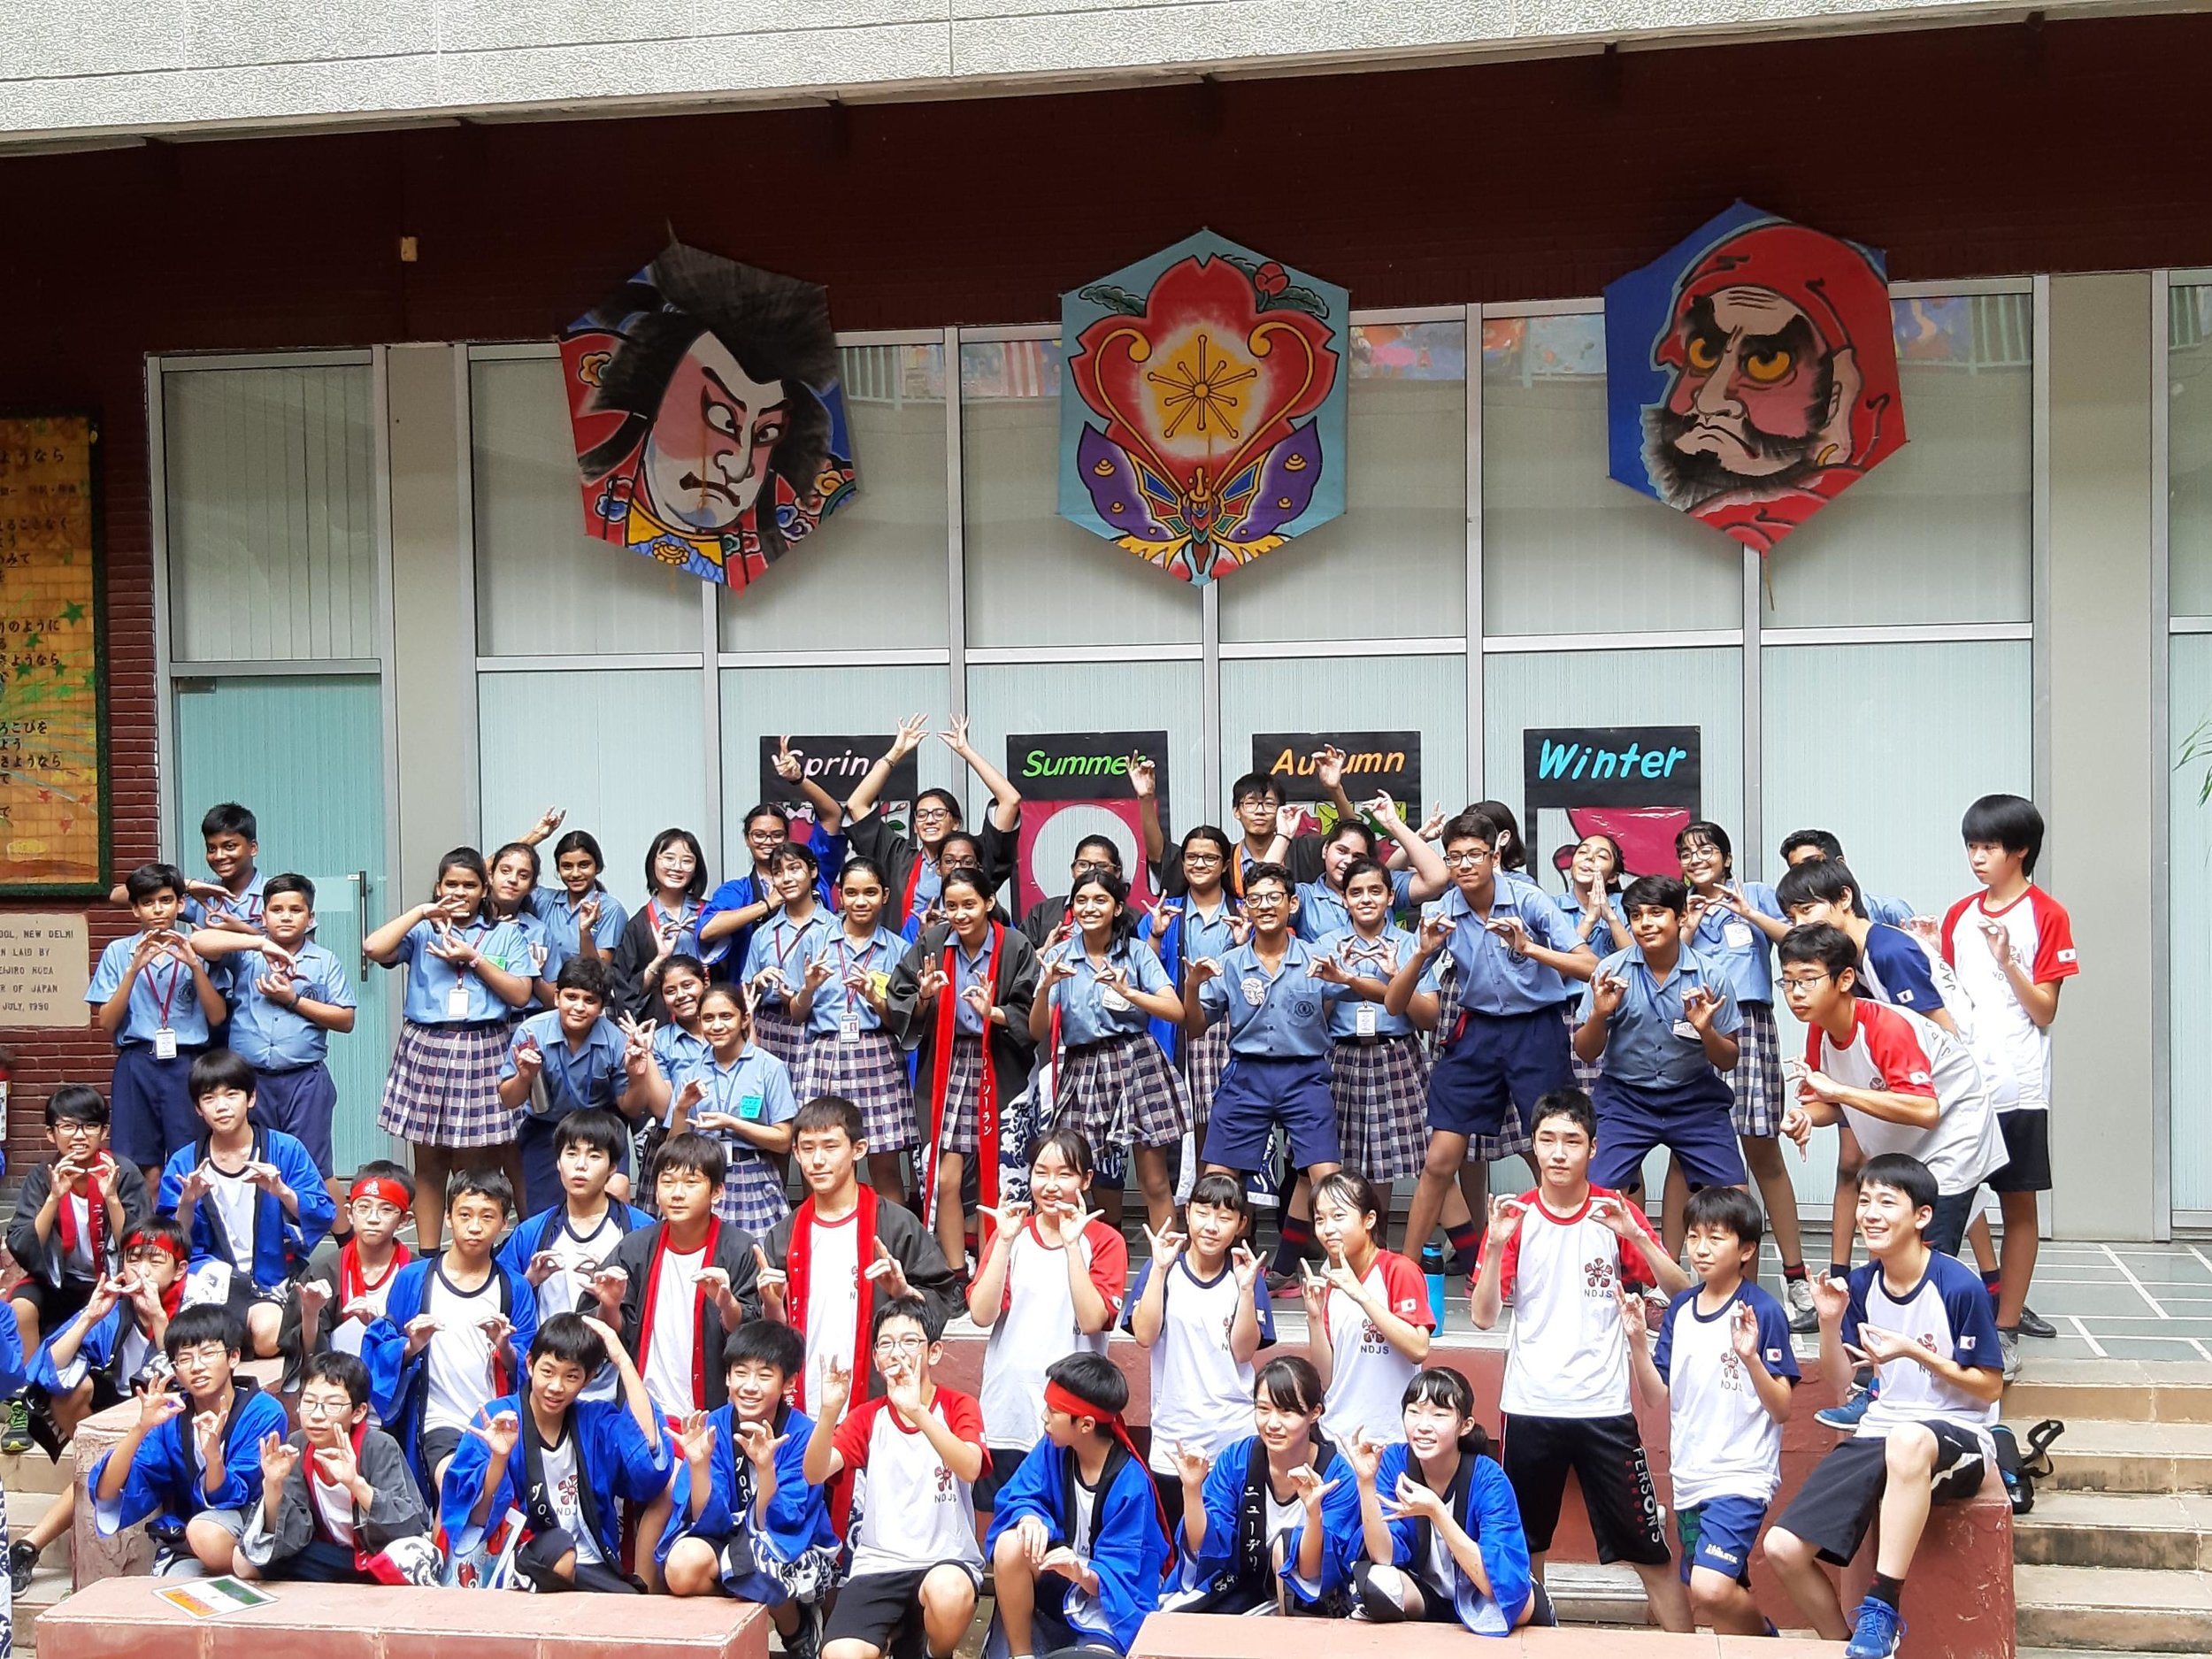 Latest in Bluebells — Bluebells School International